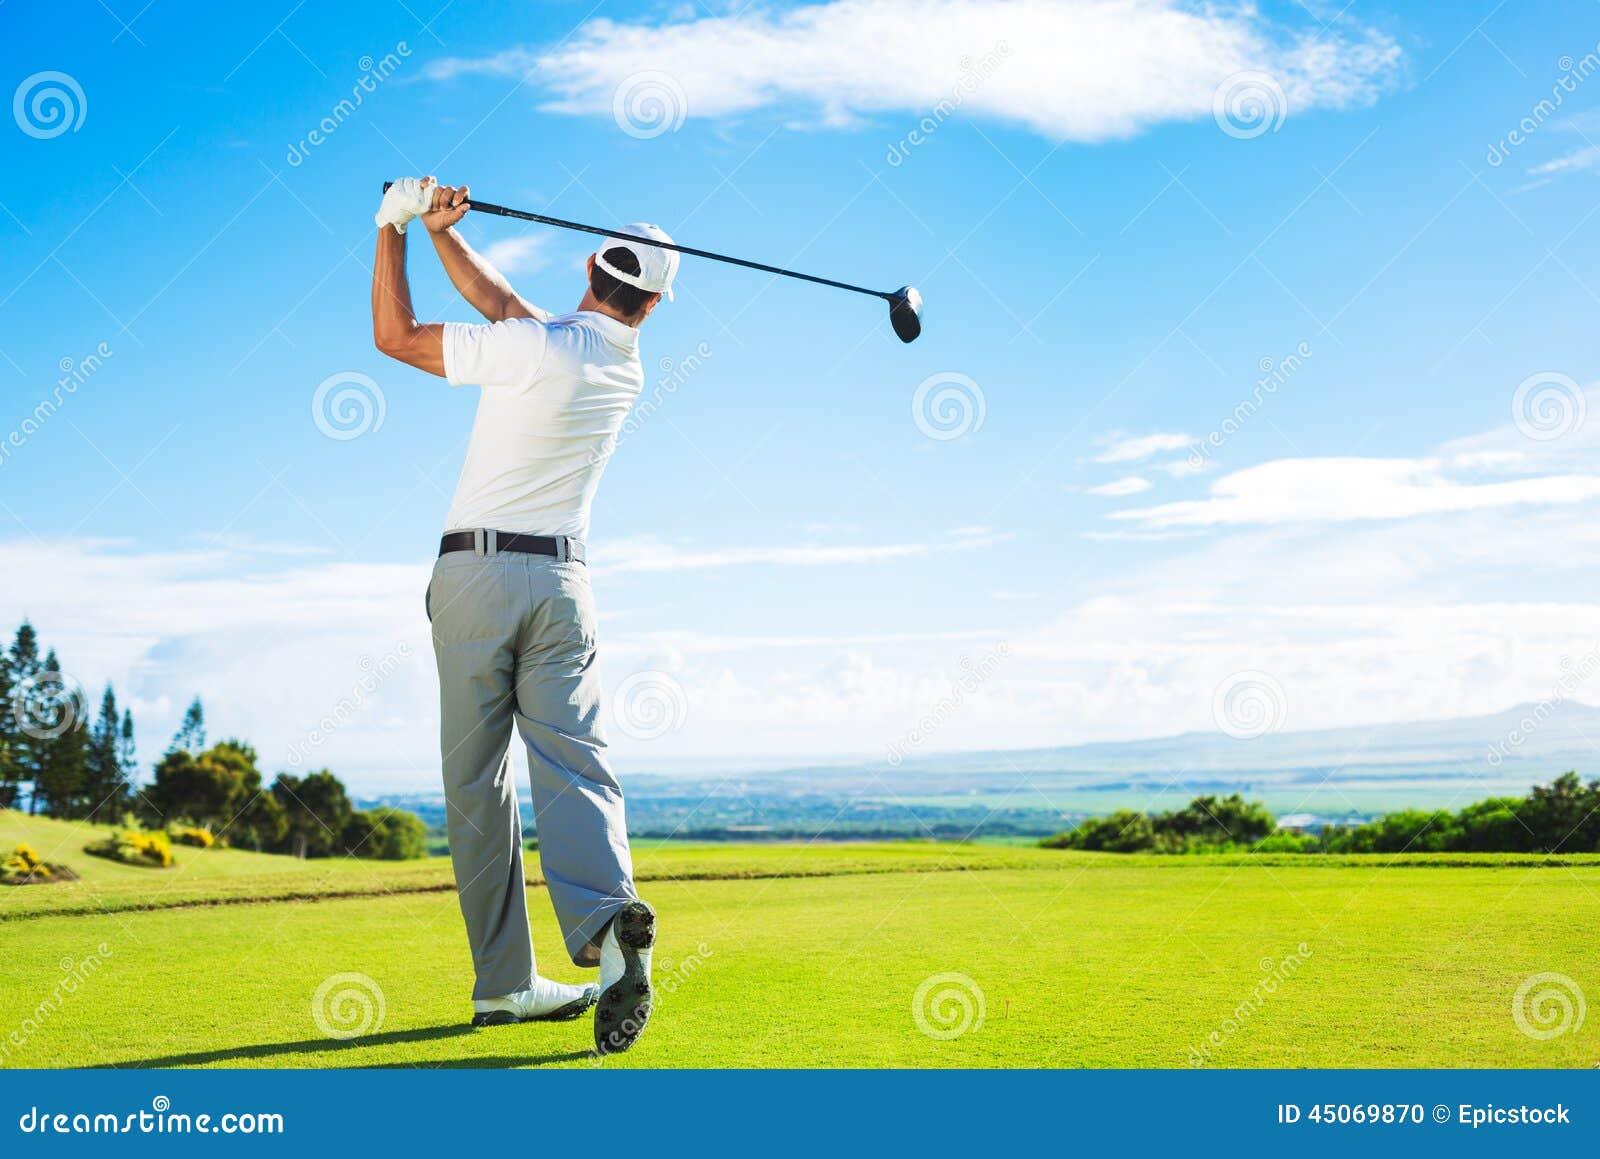 Golf jego gry